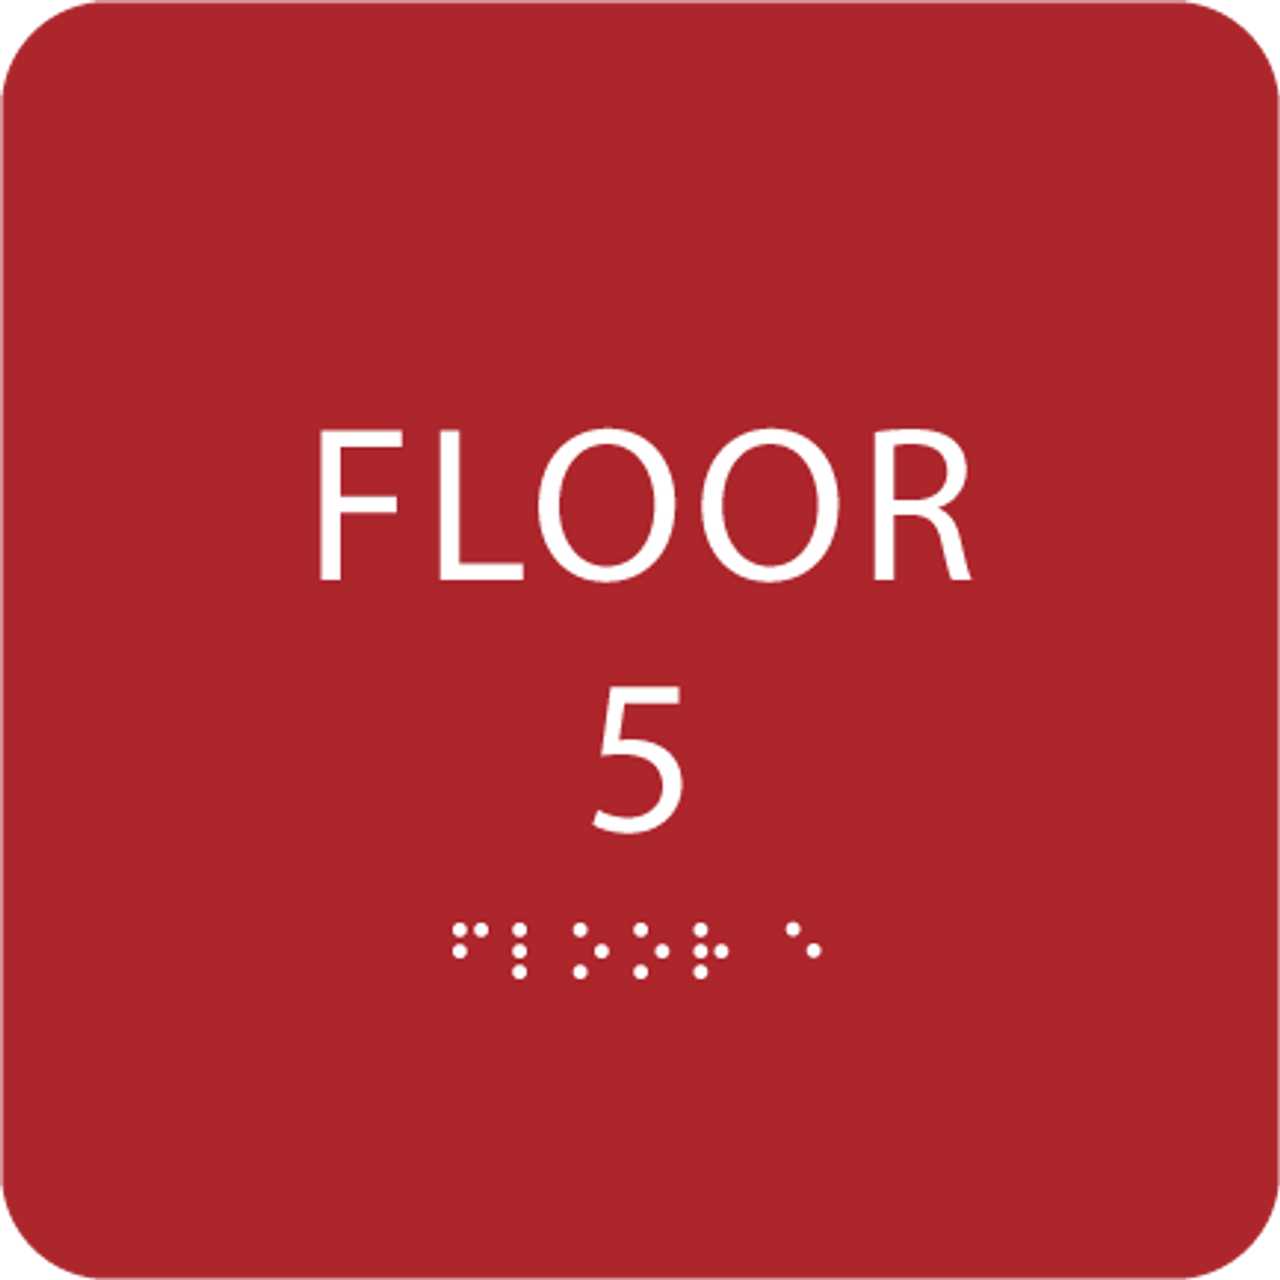 Red Floor 5 Level Identification Sign